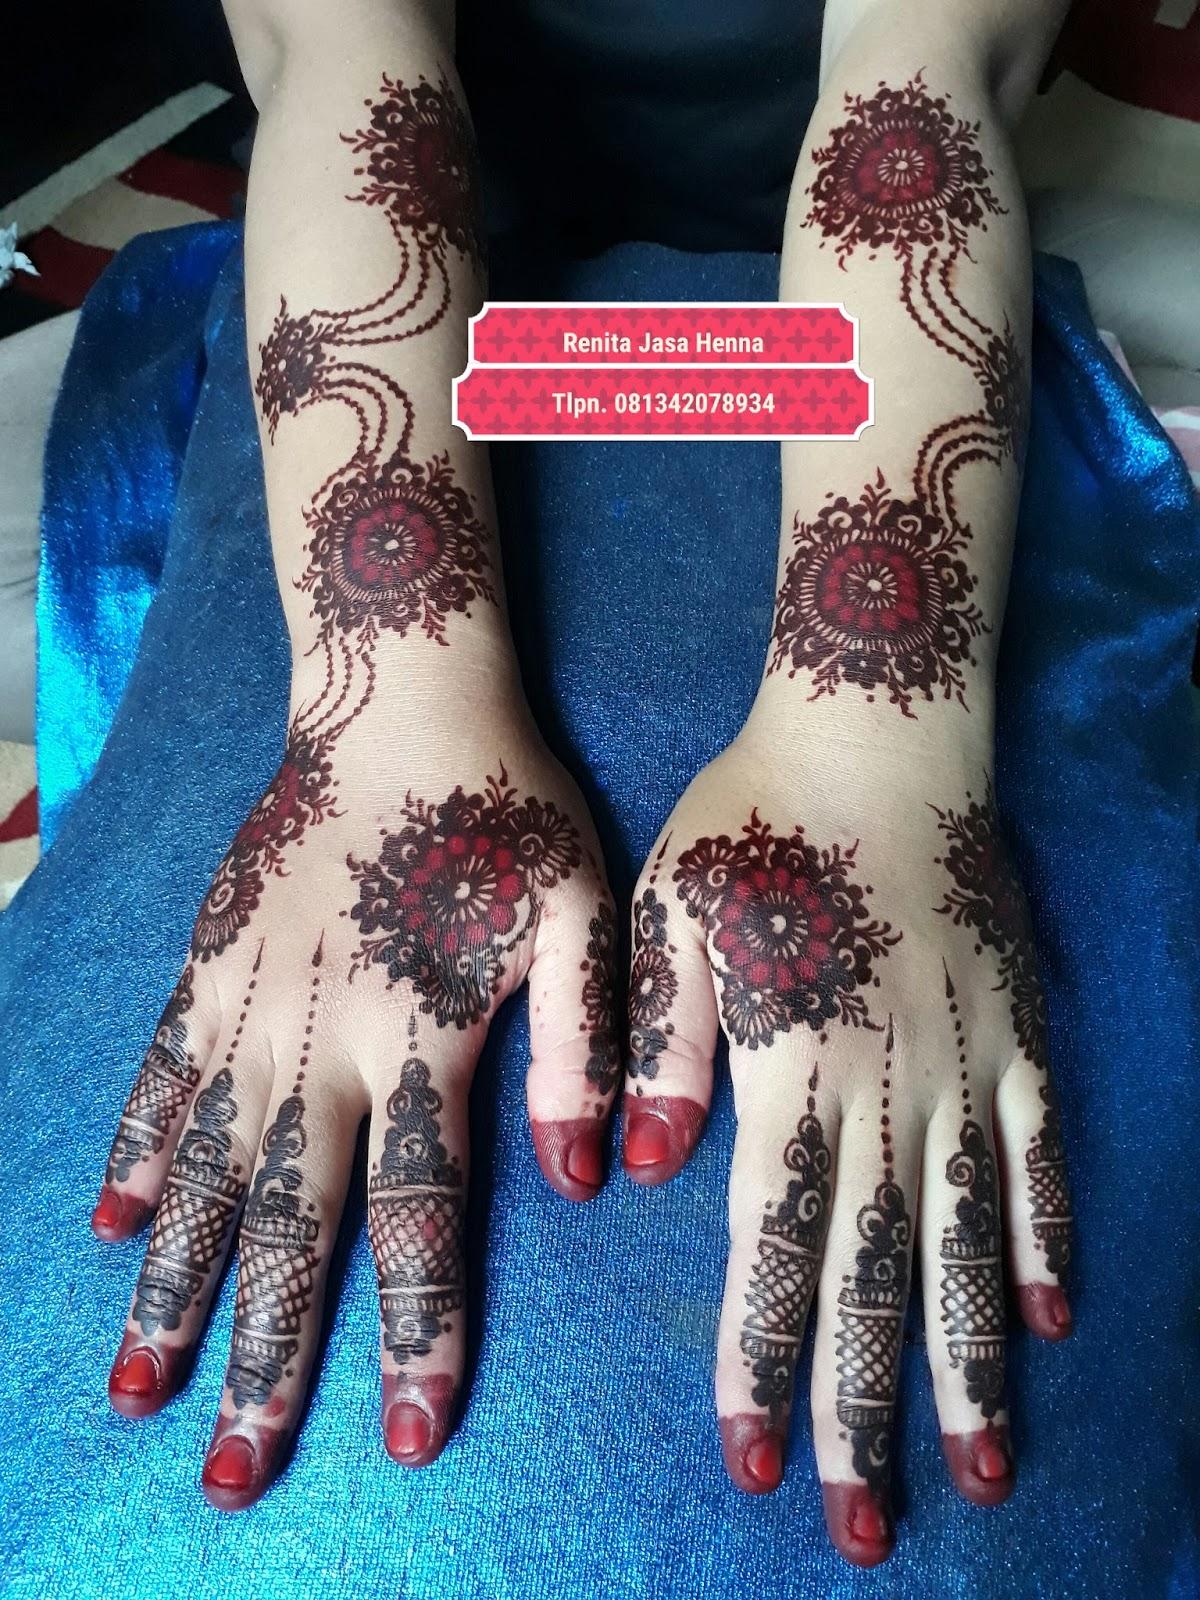 Jasa Henna Pengantin Renita Maros Henna Wedding Marun